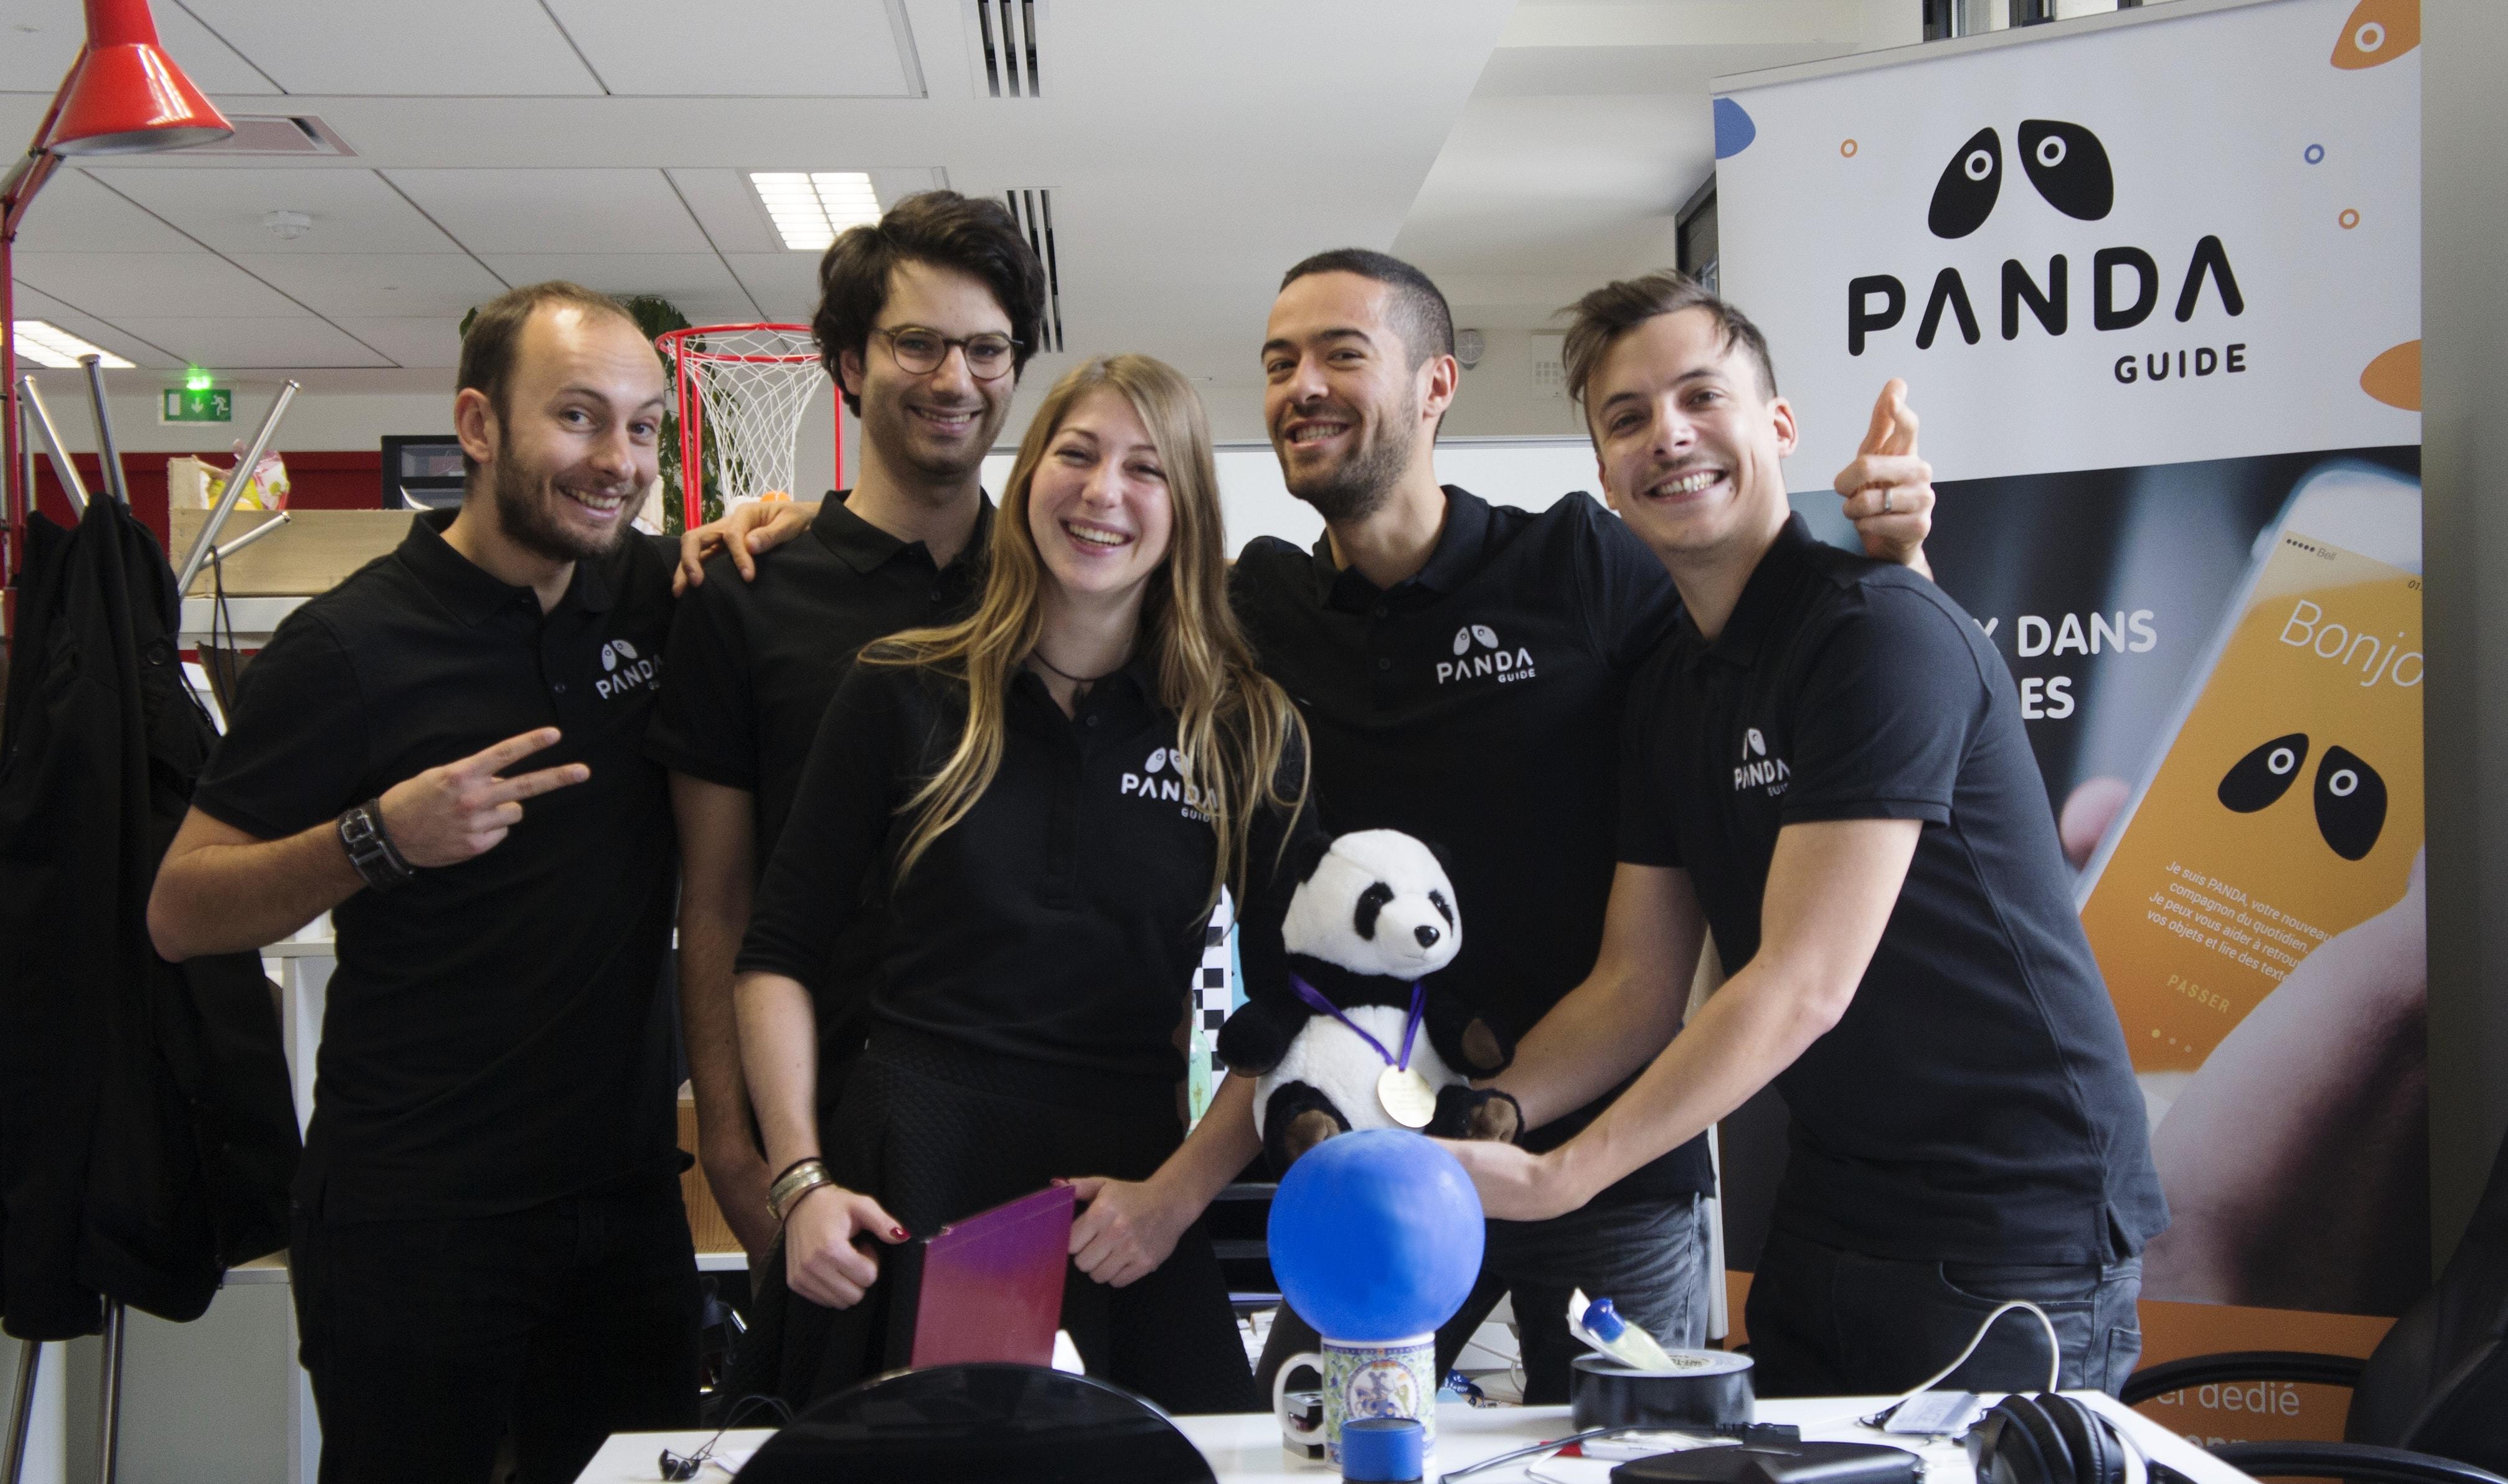 équipe panda-guide pour aveugles